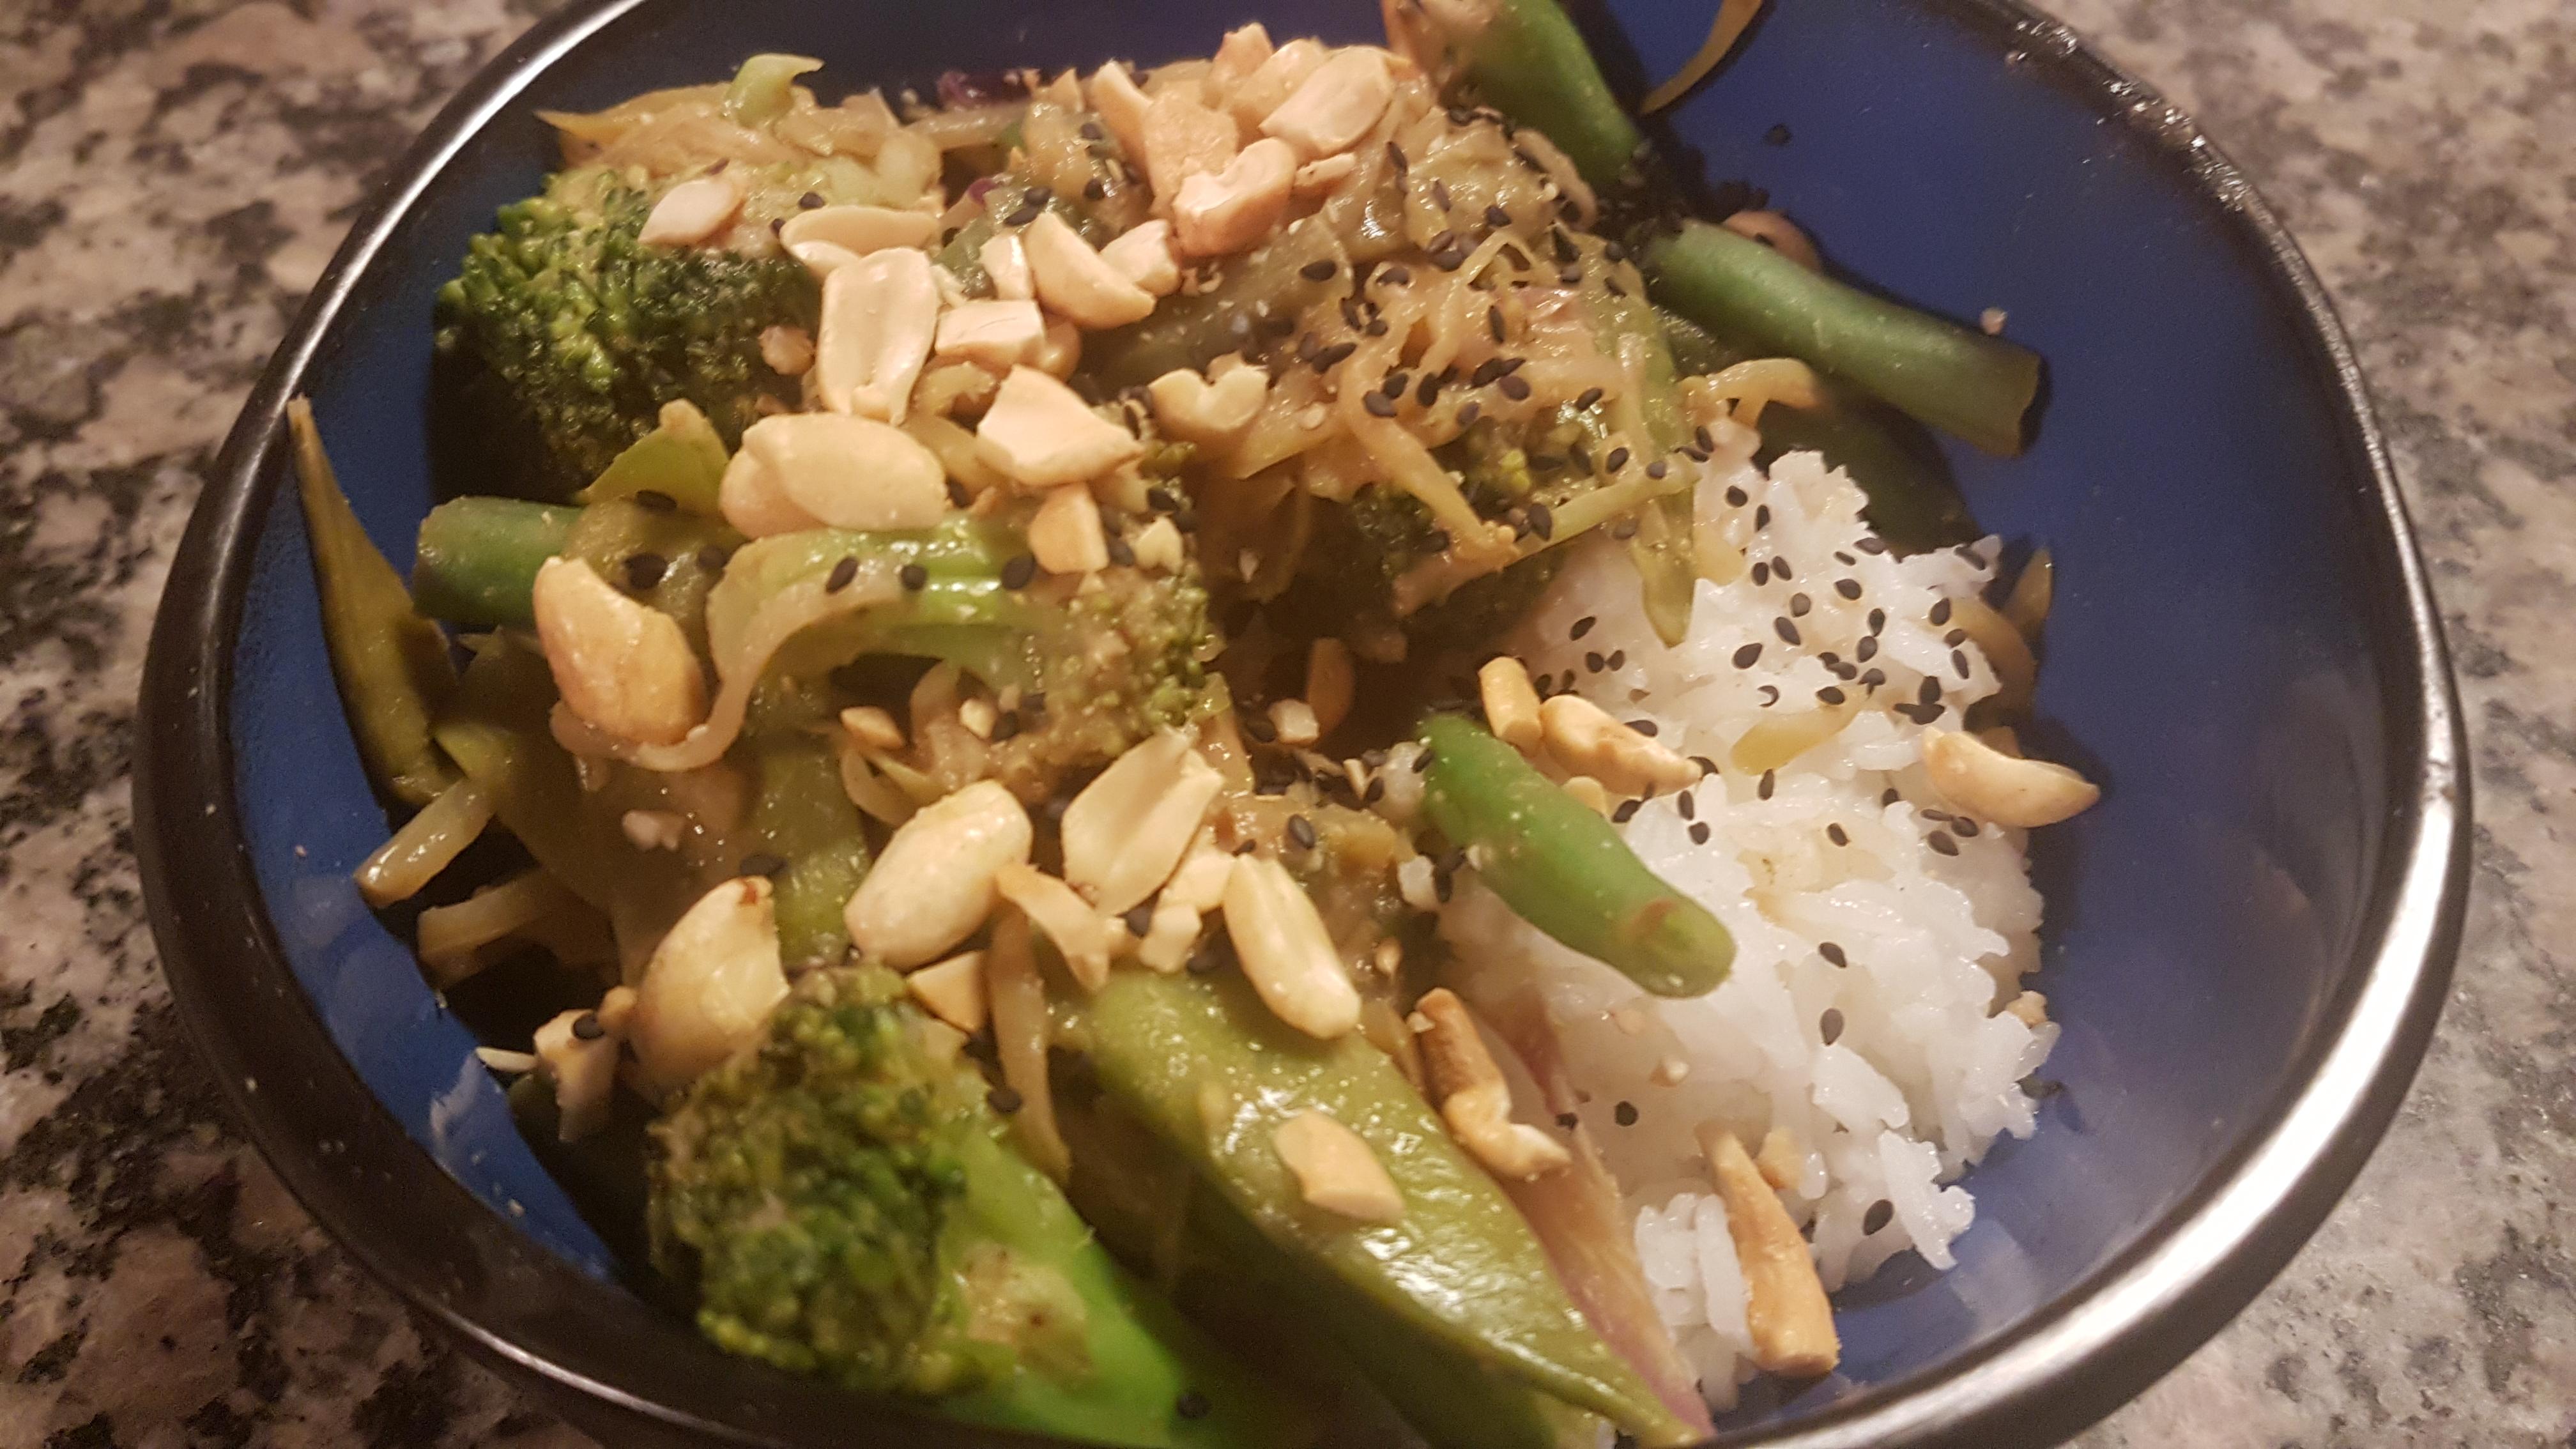 green veggie stir fry